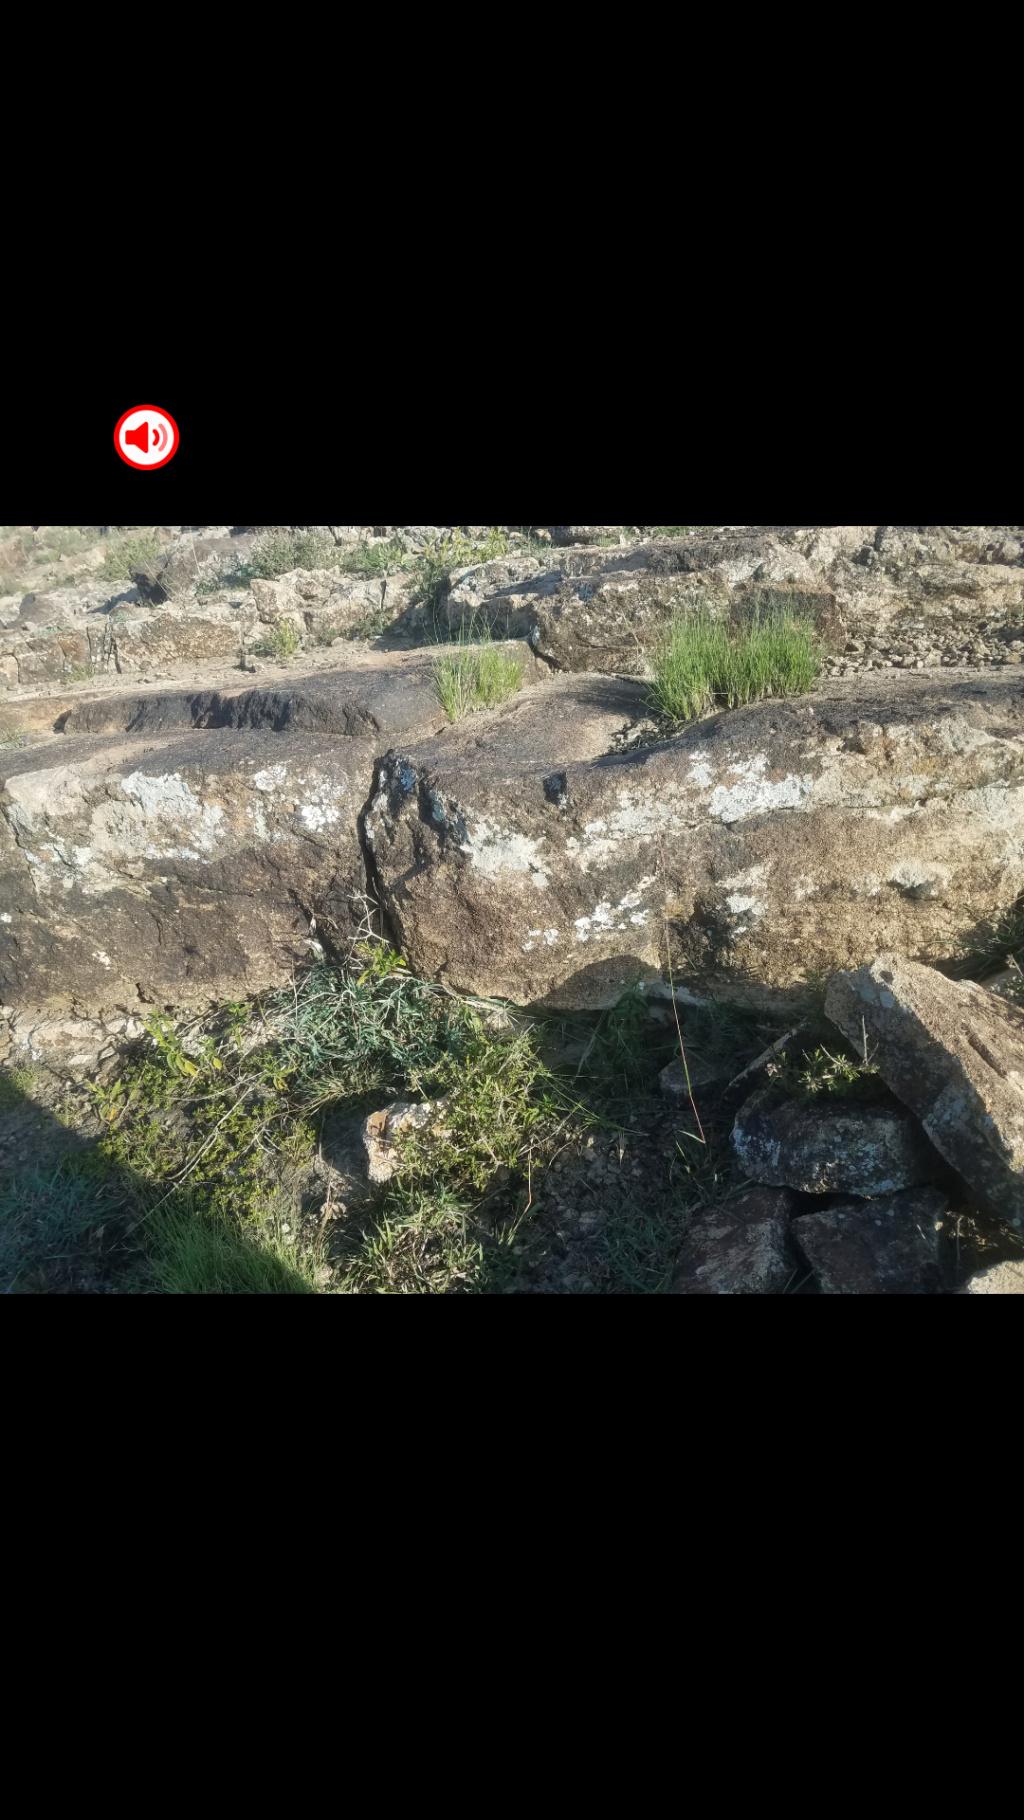 تحليل اشاره وكتابه على صخره  Screen17